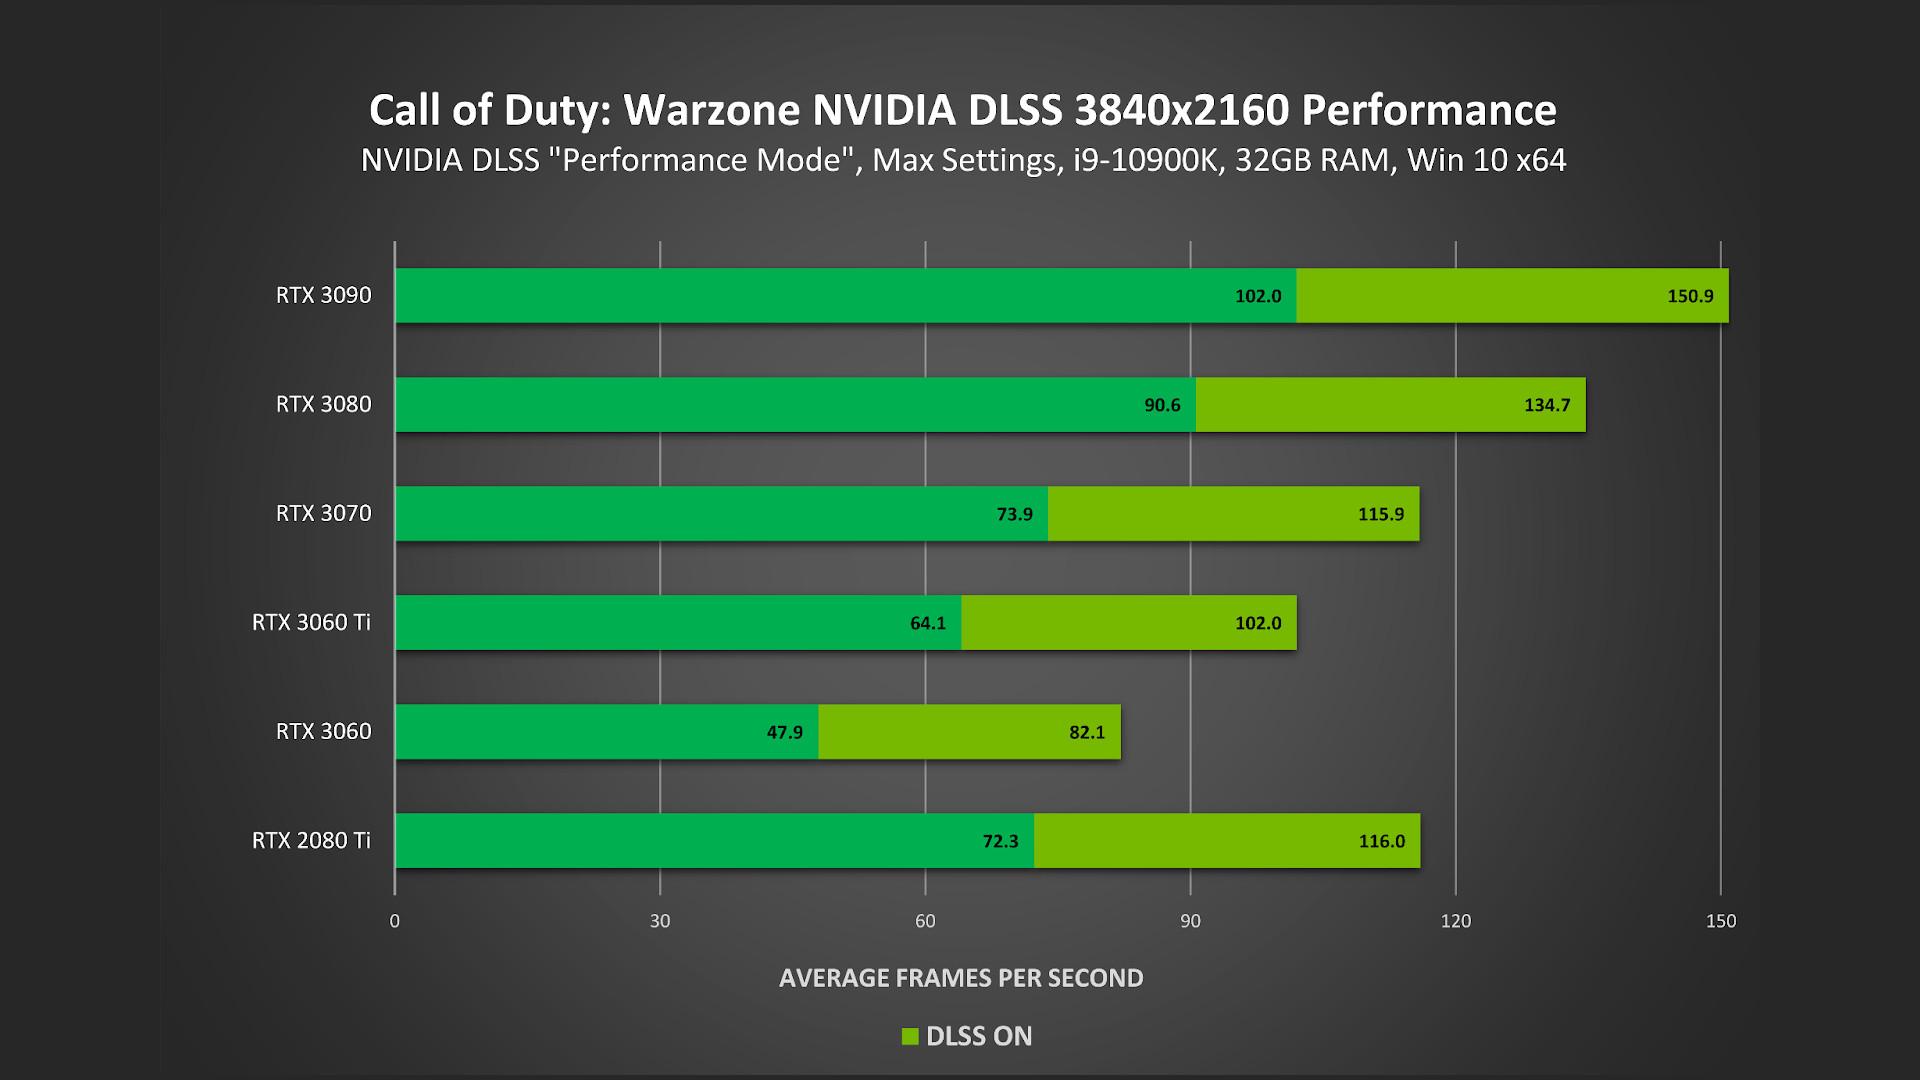 Nvidia DLSS Call of Duty